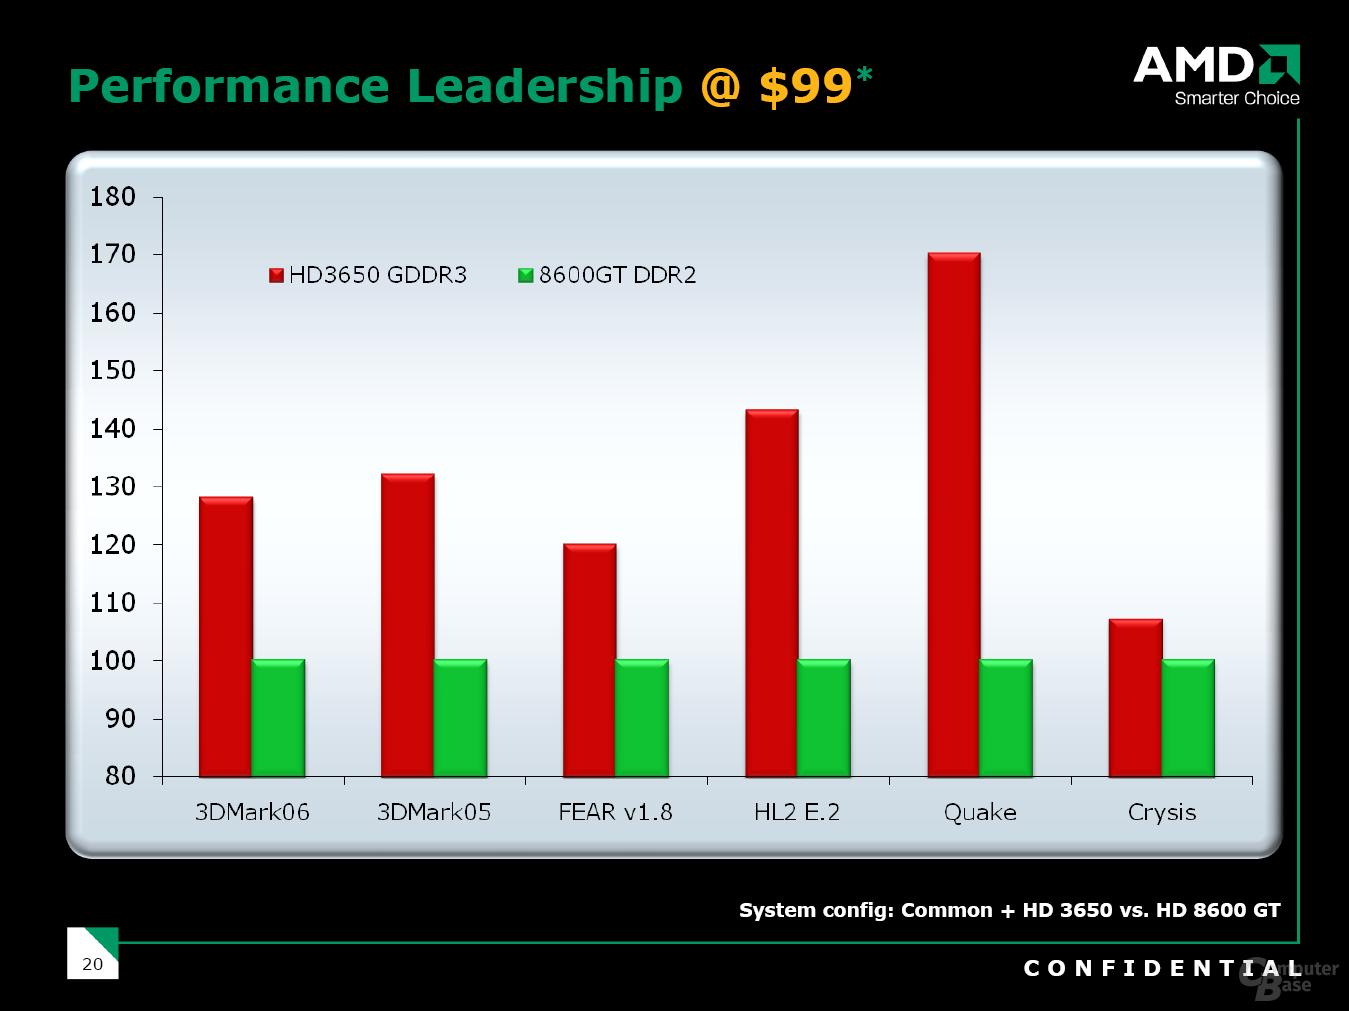 Radeon HD 3650 GDDR3 Performance